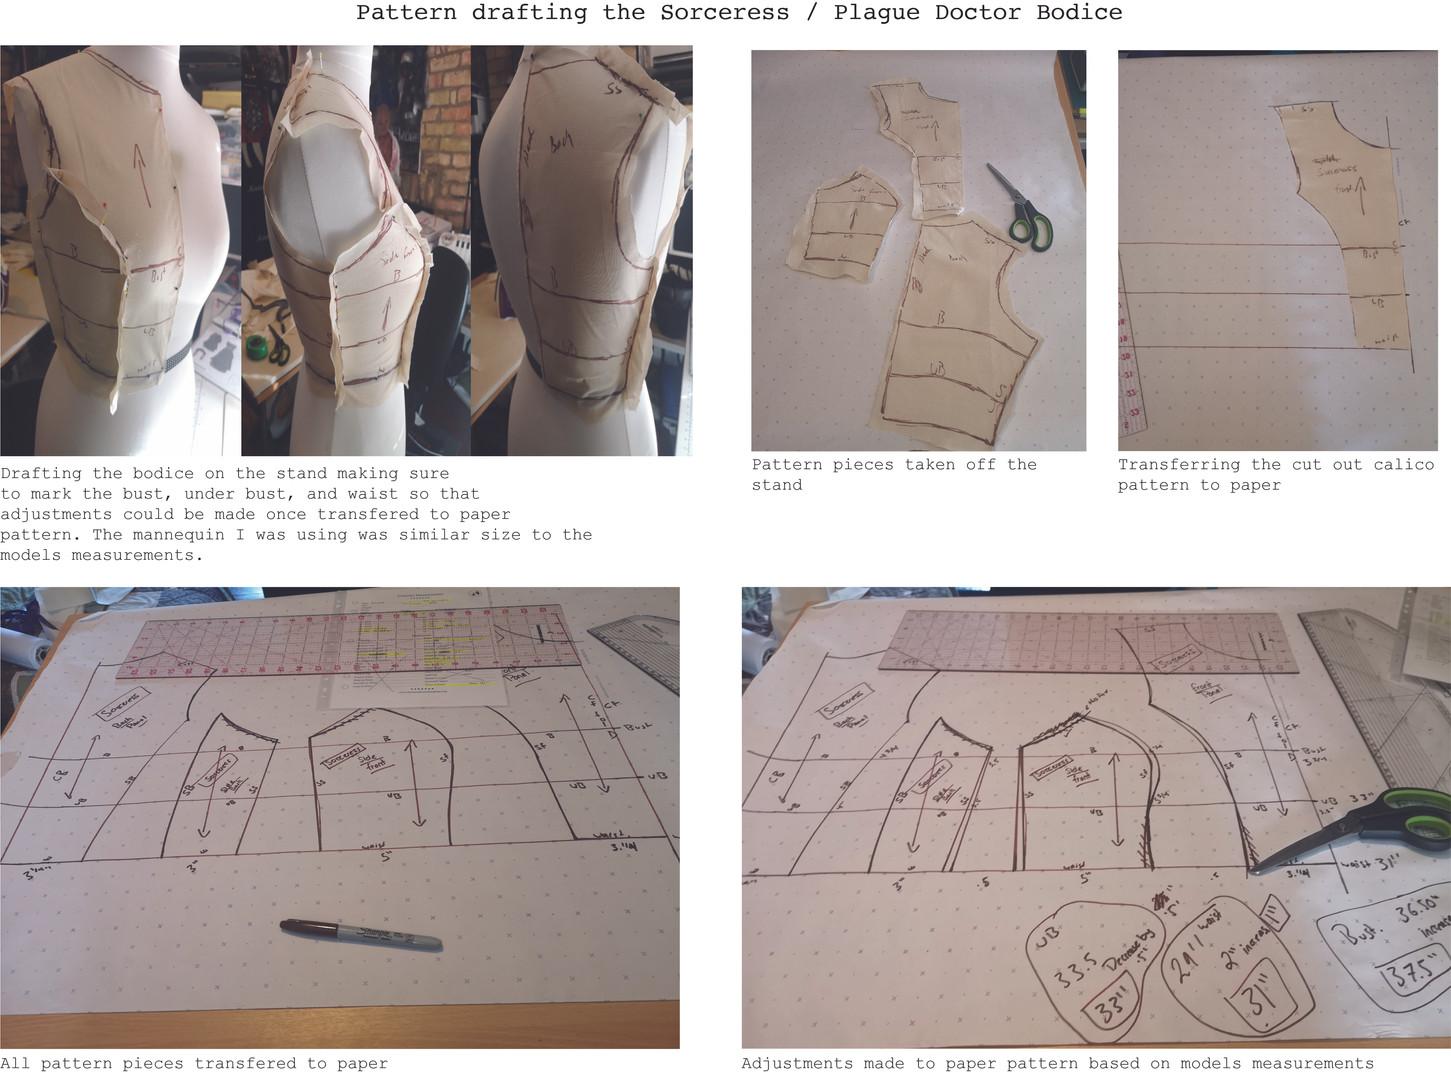 Bodice Pattern Drafting